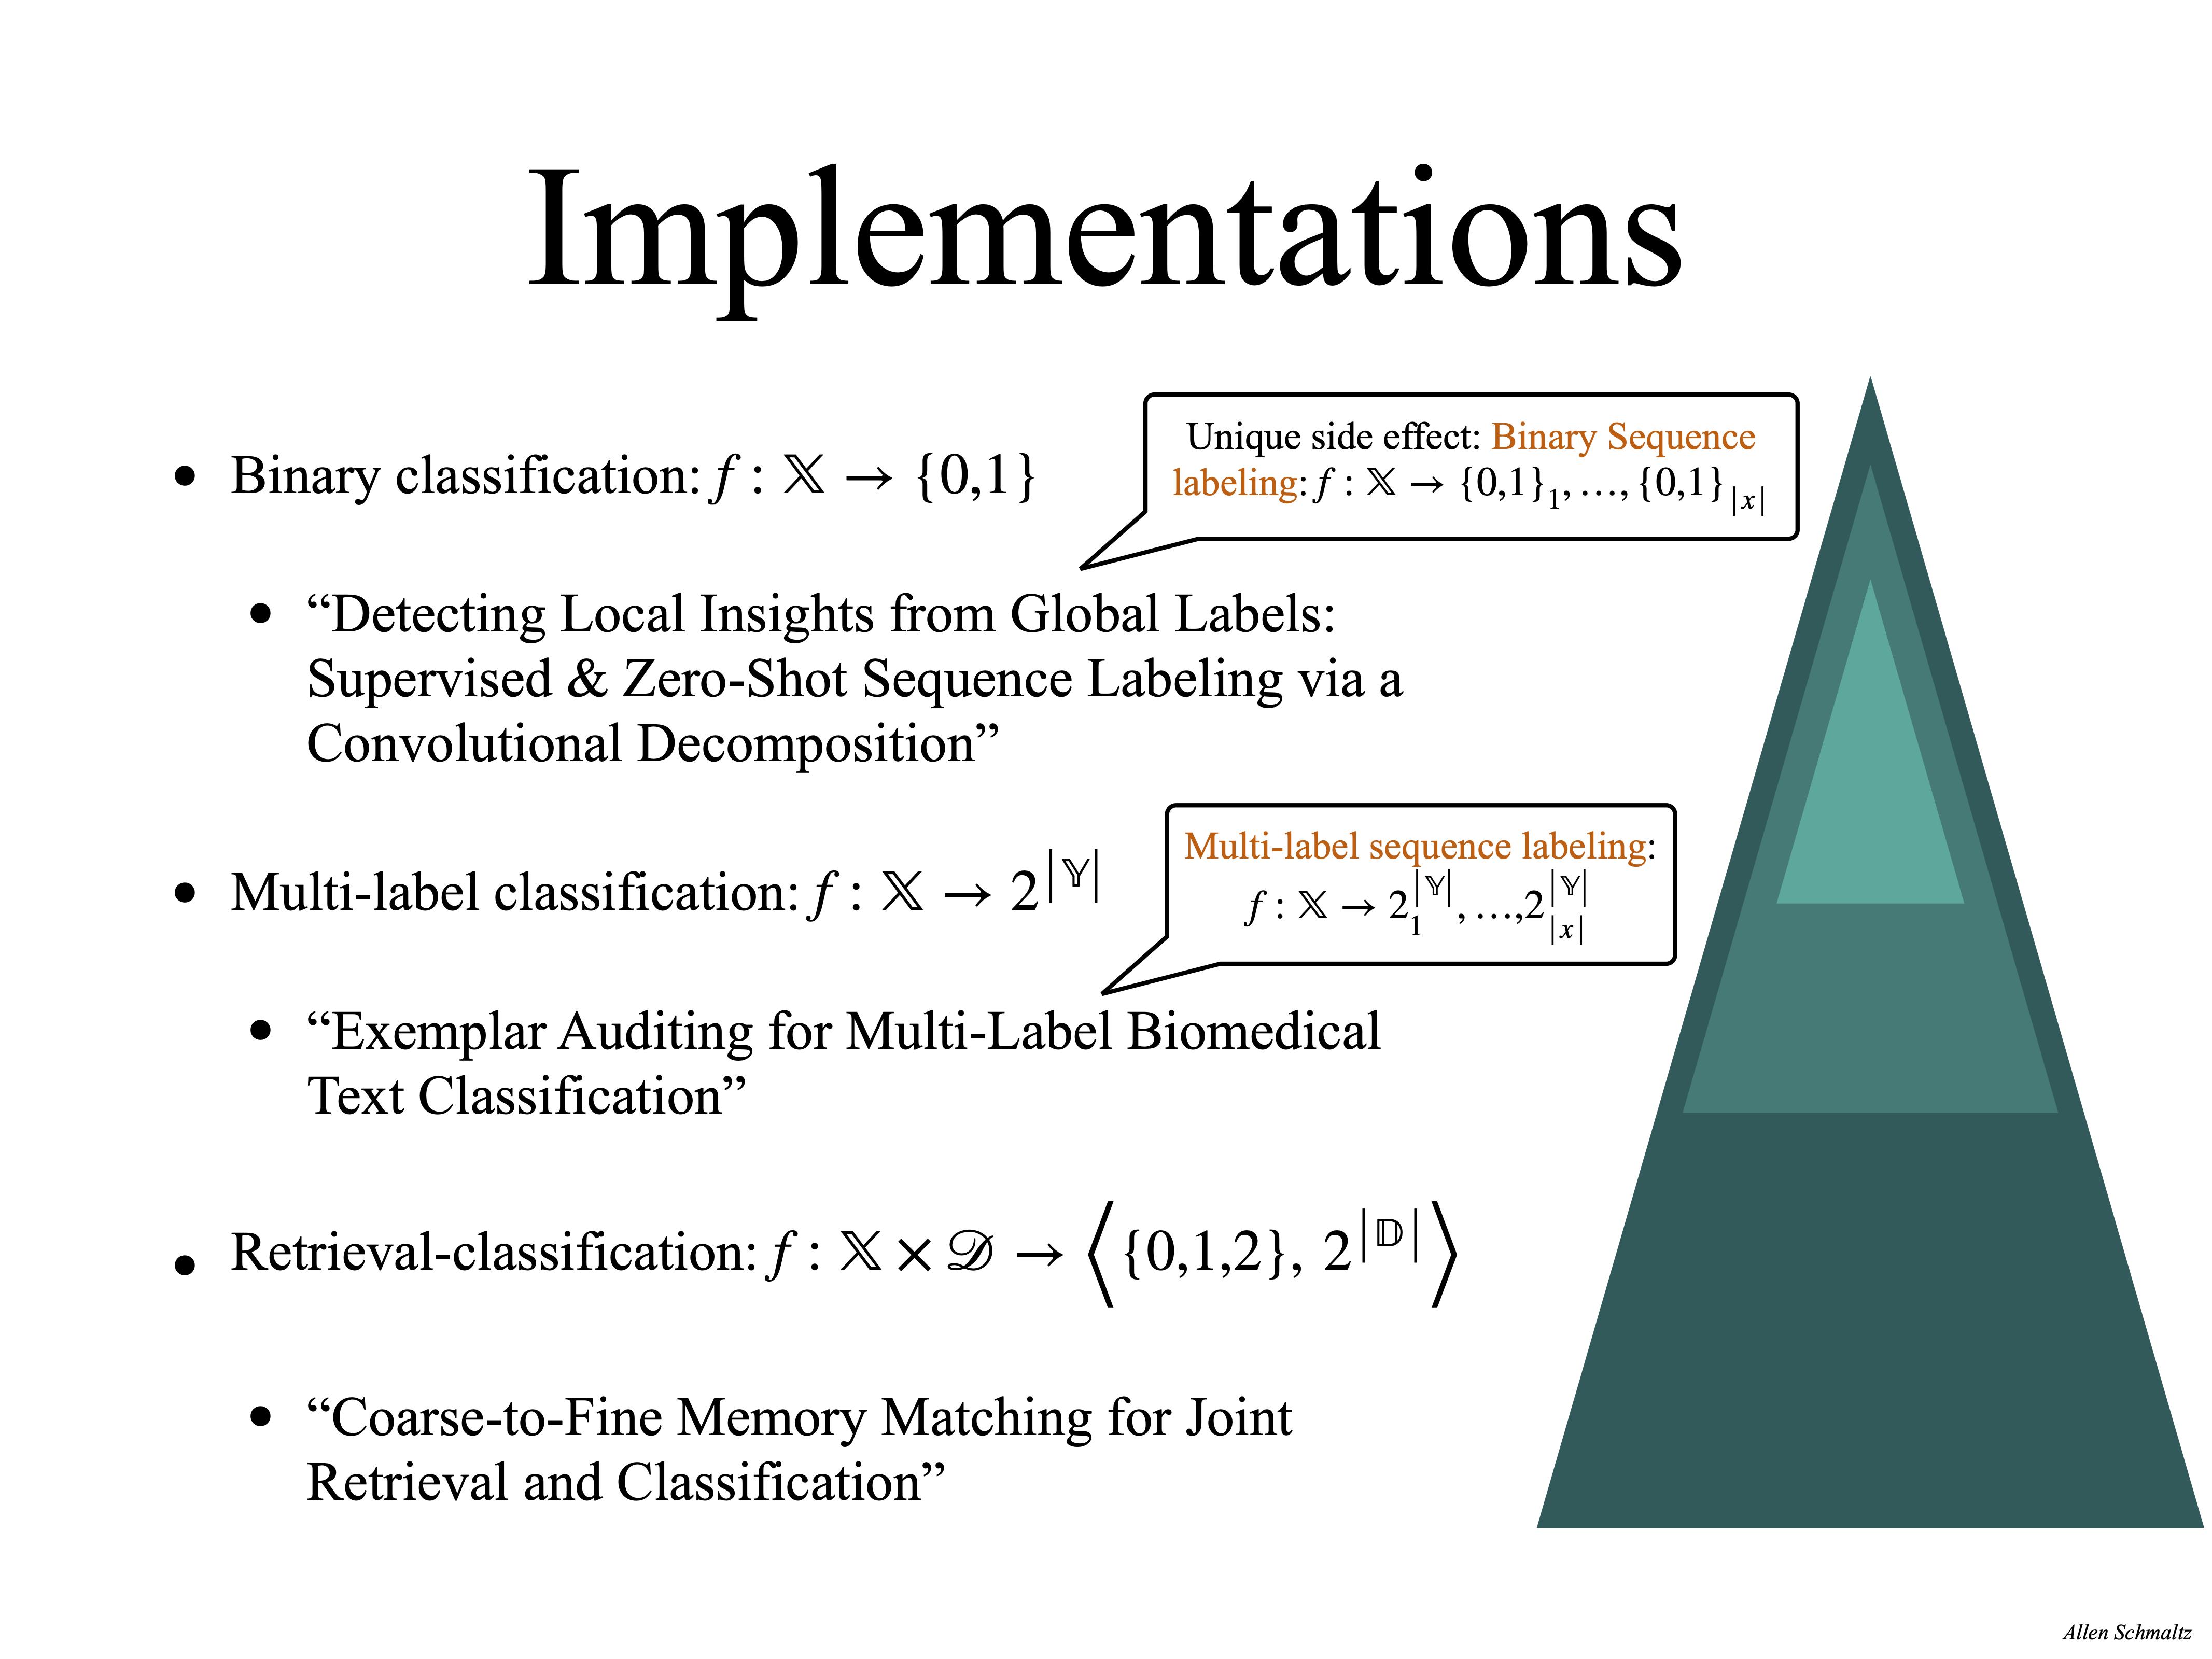 Exemplar Auditing Implementations